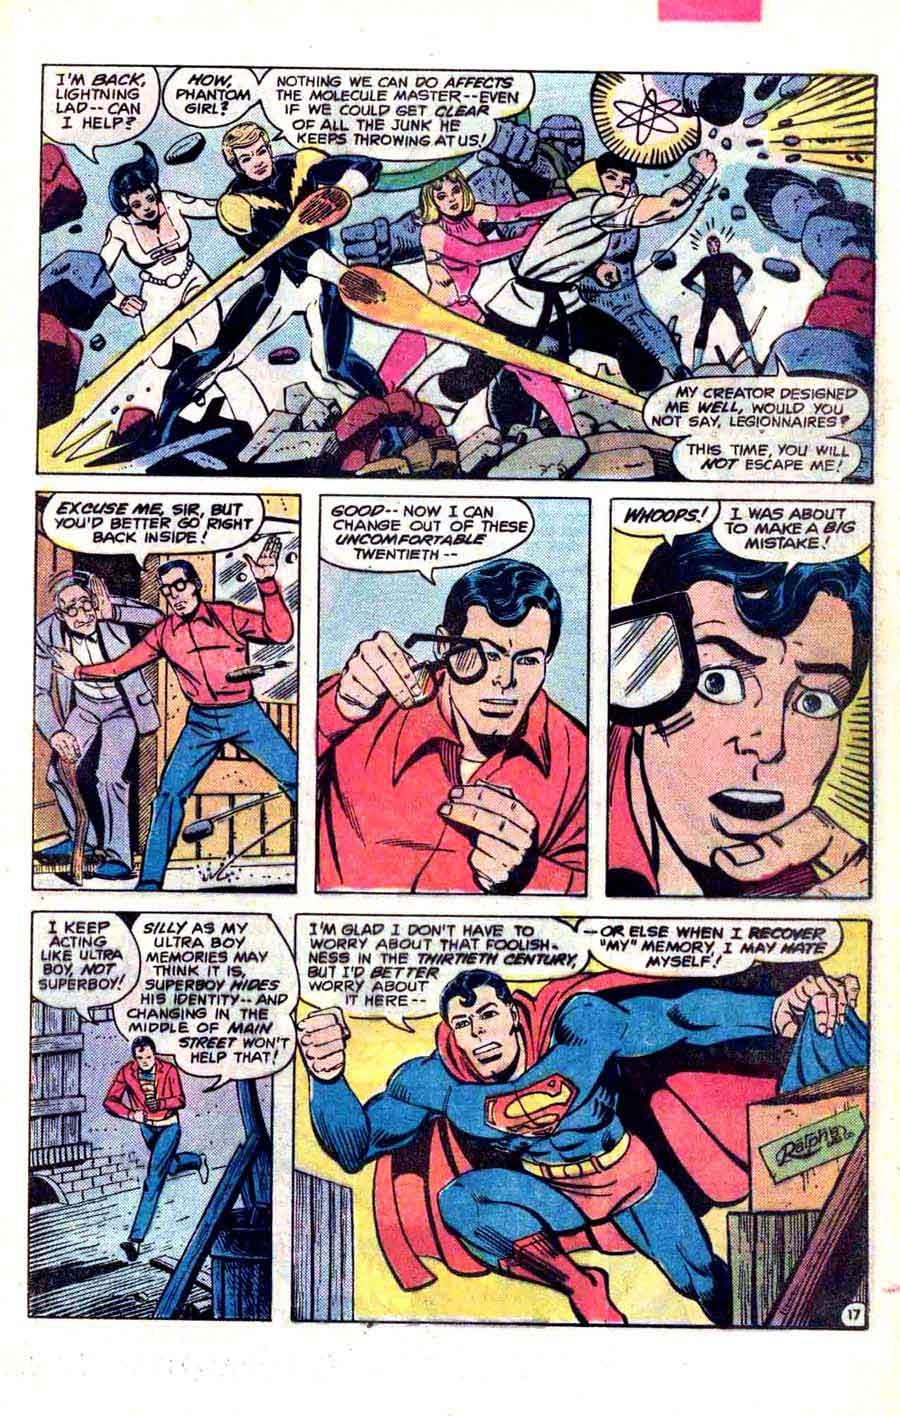 Legion of Super-Heroes v2 #281 - Steve Ditko dc 1980s comic book page art